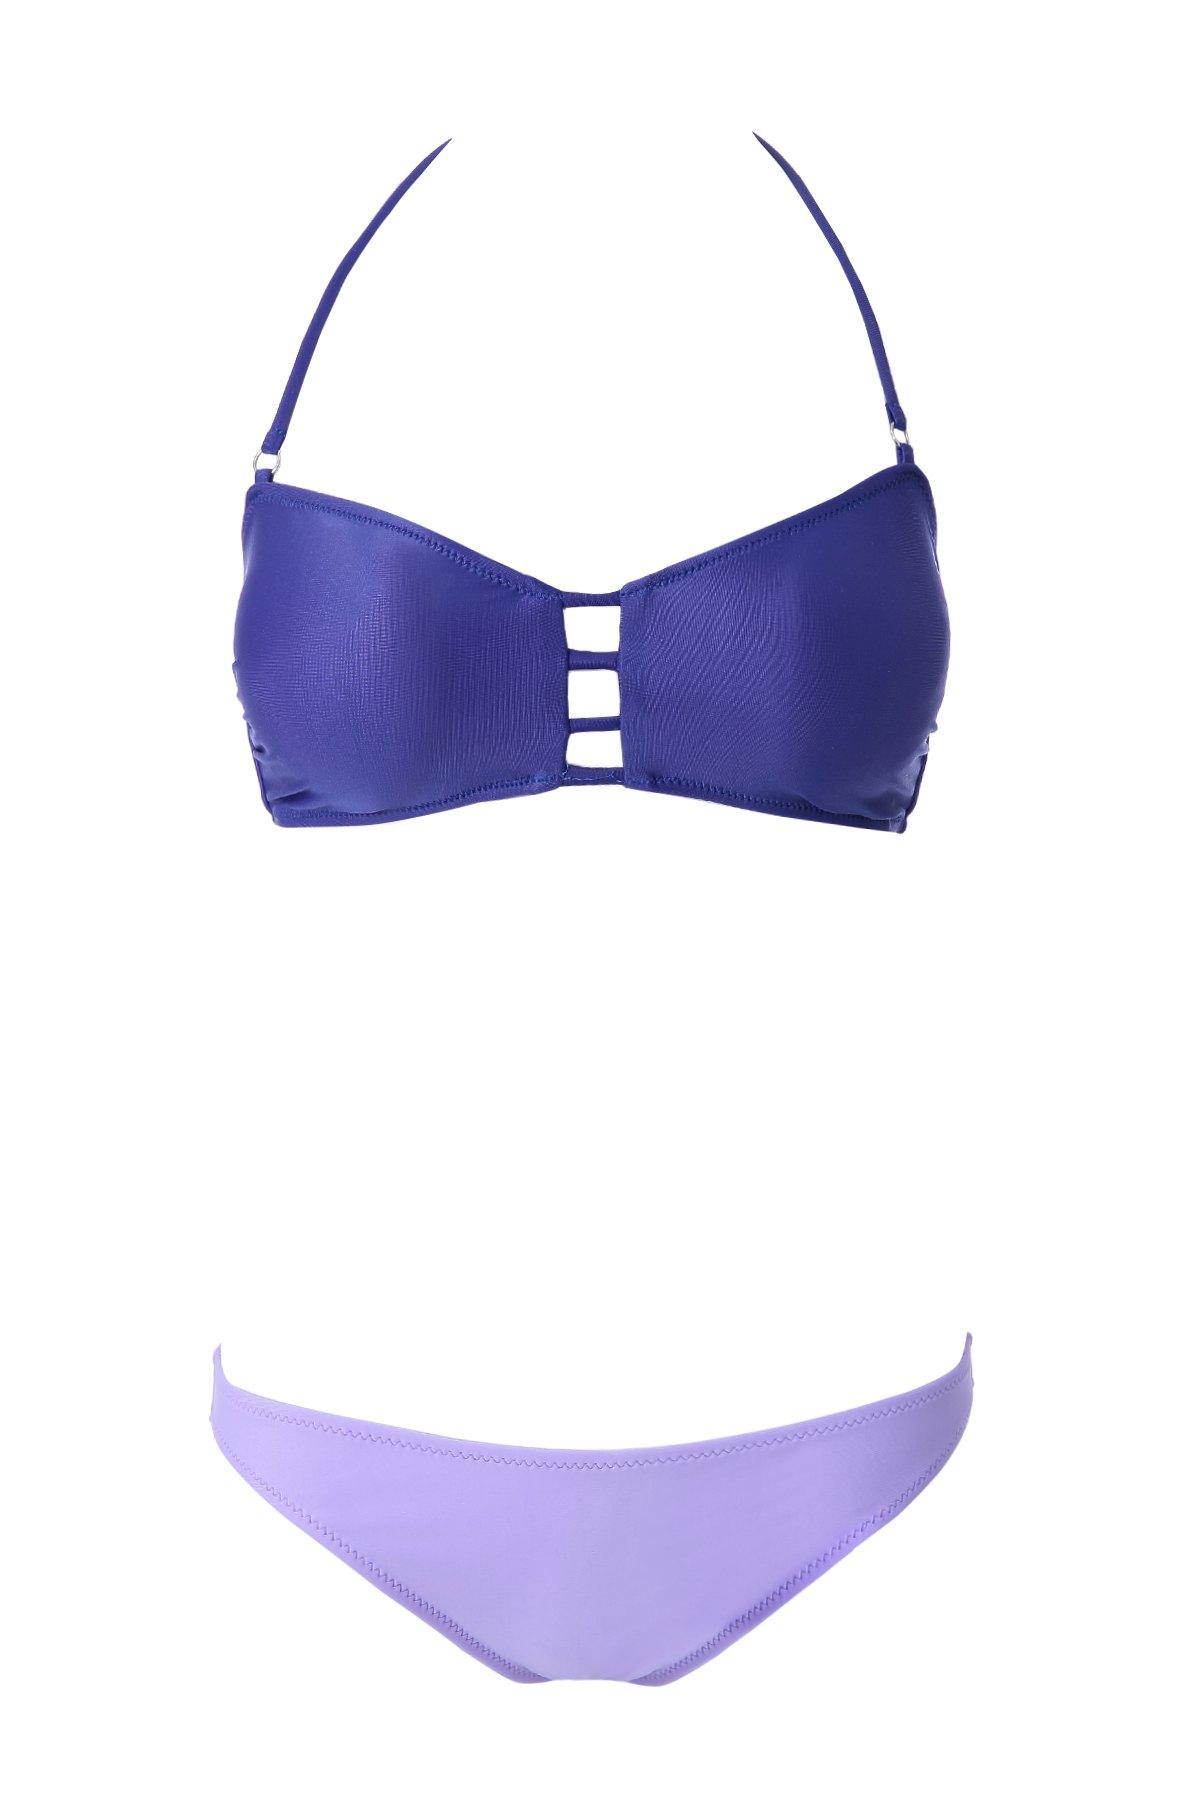 Openwork Bandage Color Block Bikini Set